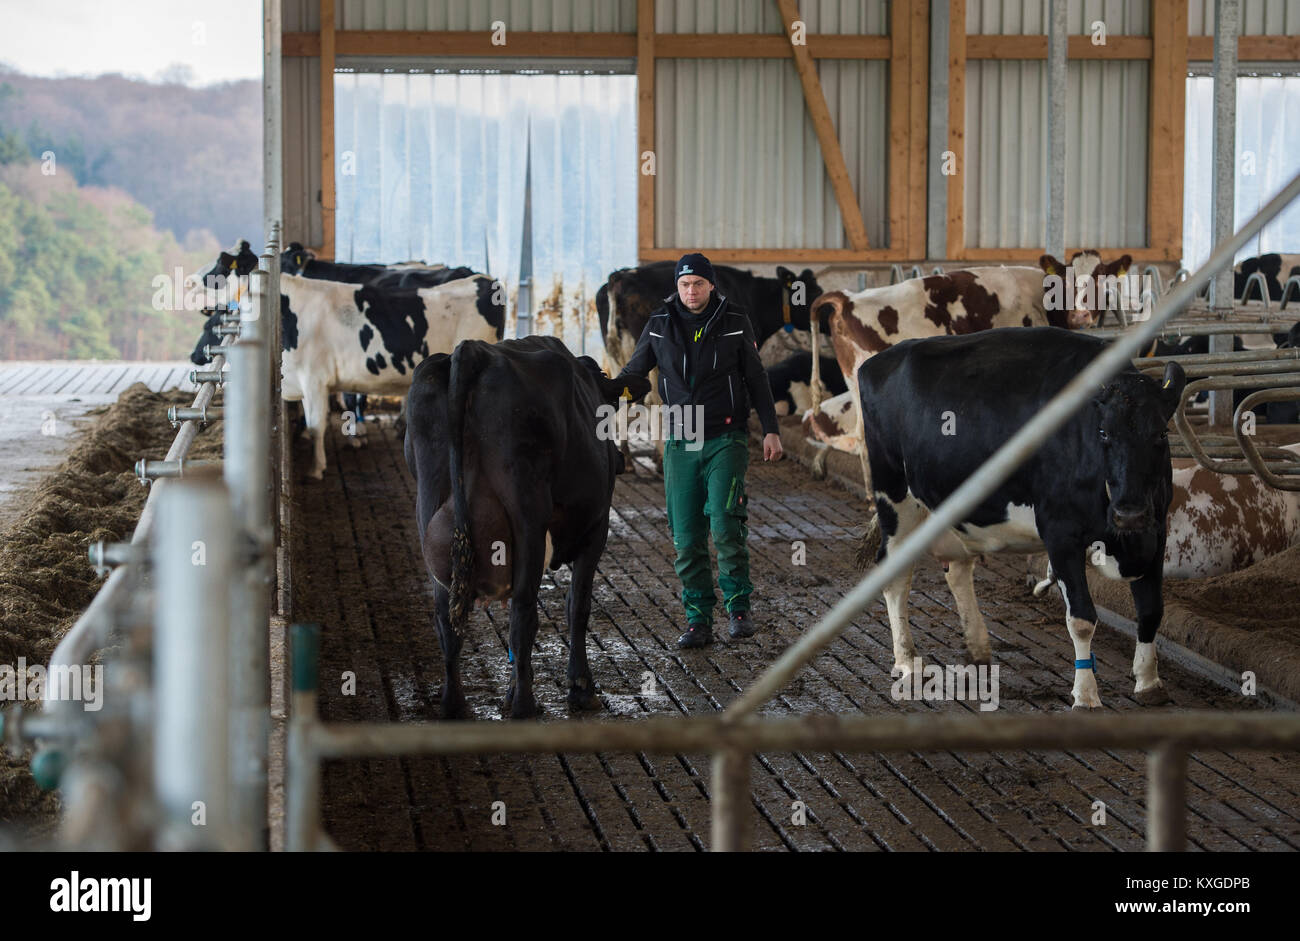 Neunkirchen-Seelscheid, Germany. 08th Jan, 2018. Farmer Marcel Andree driving a cow to a milking machine in Neunkirchen - Stock Image